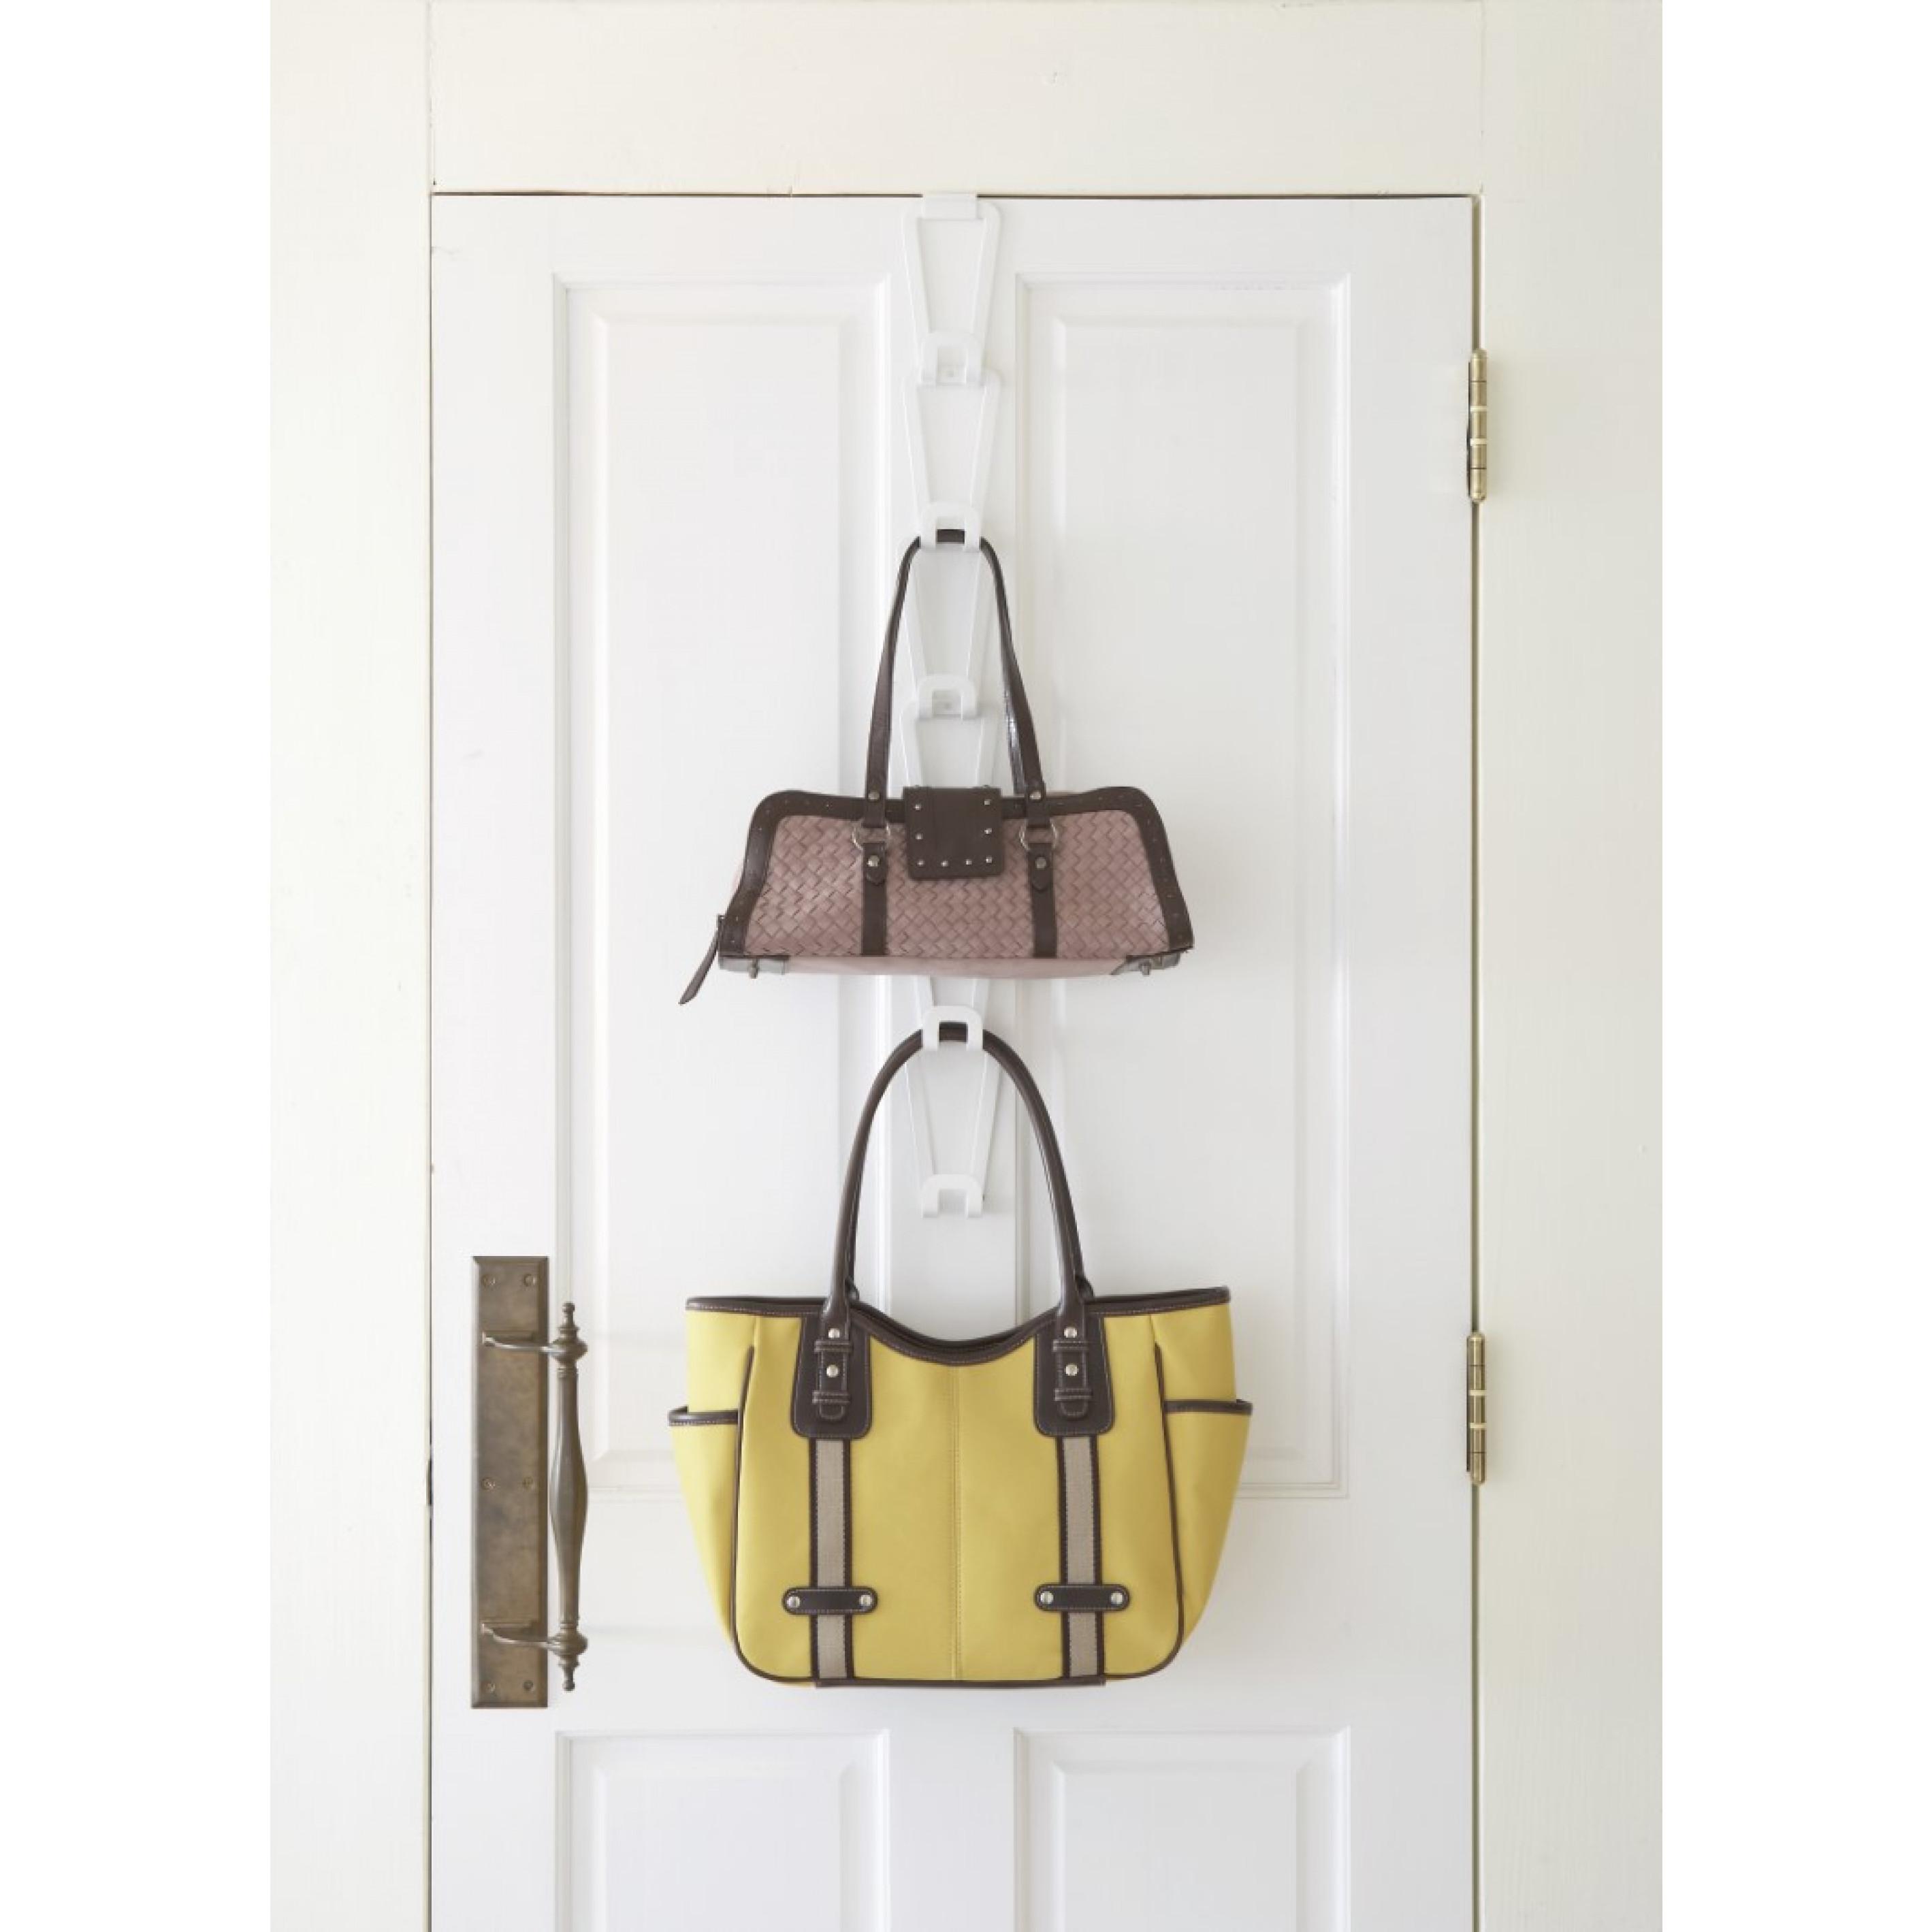 Joint Bag Holder Chain S   White